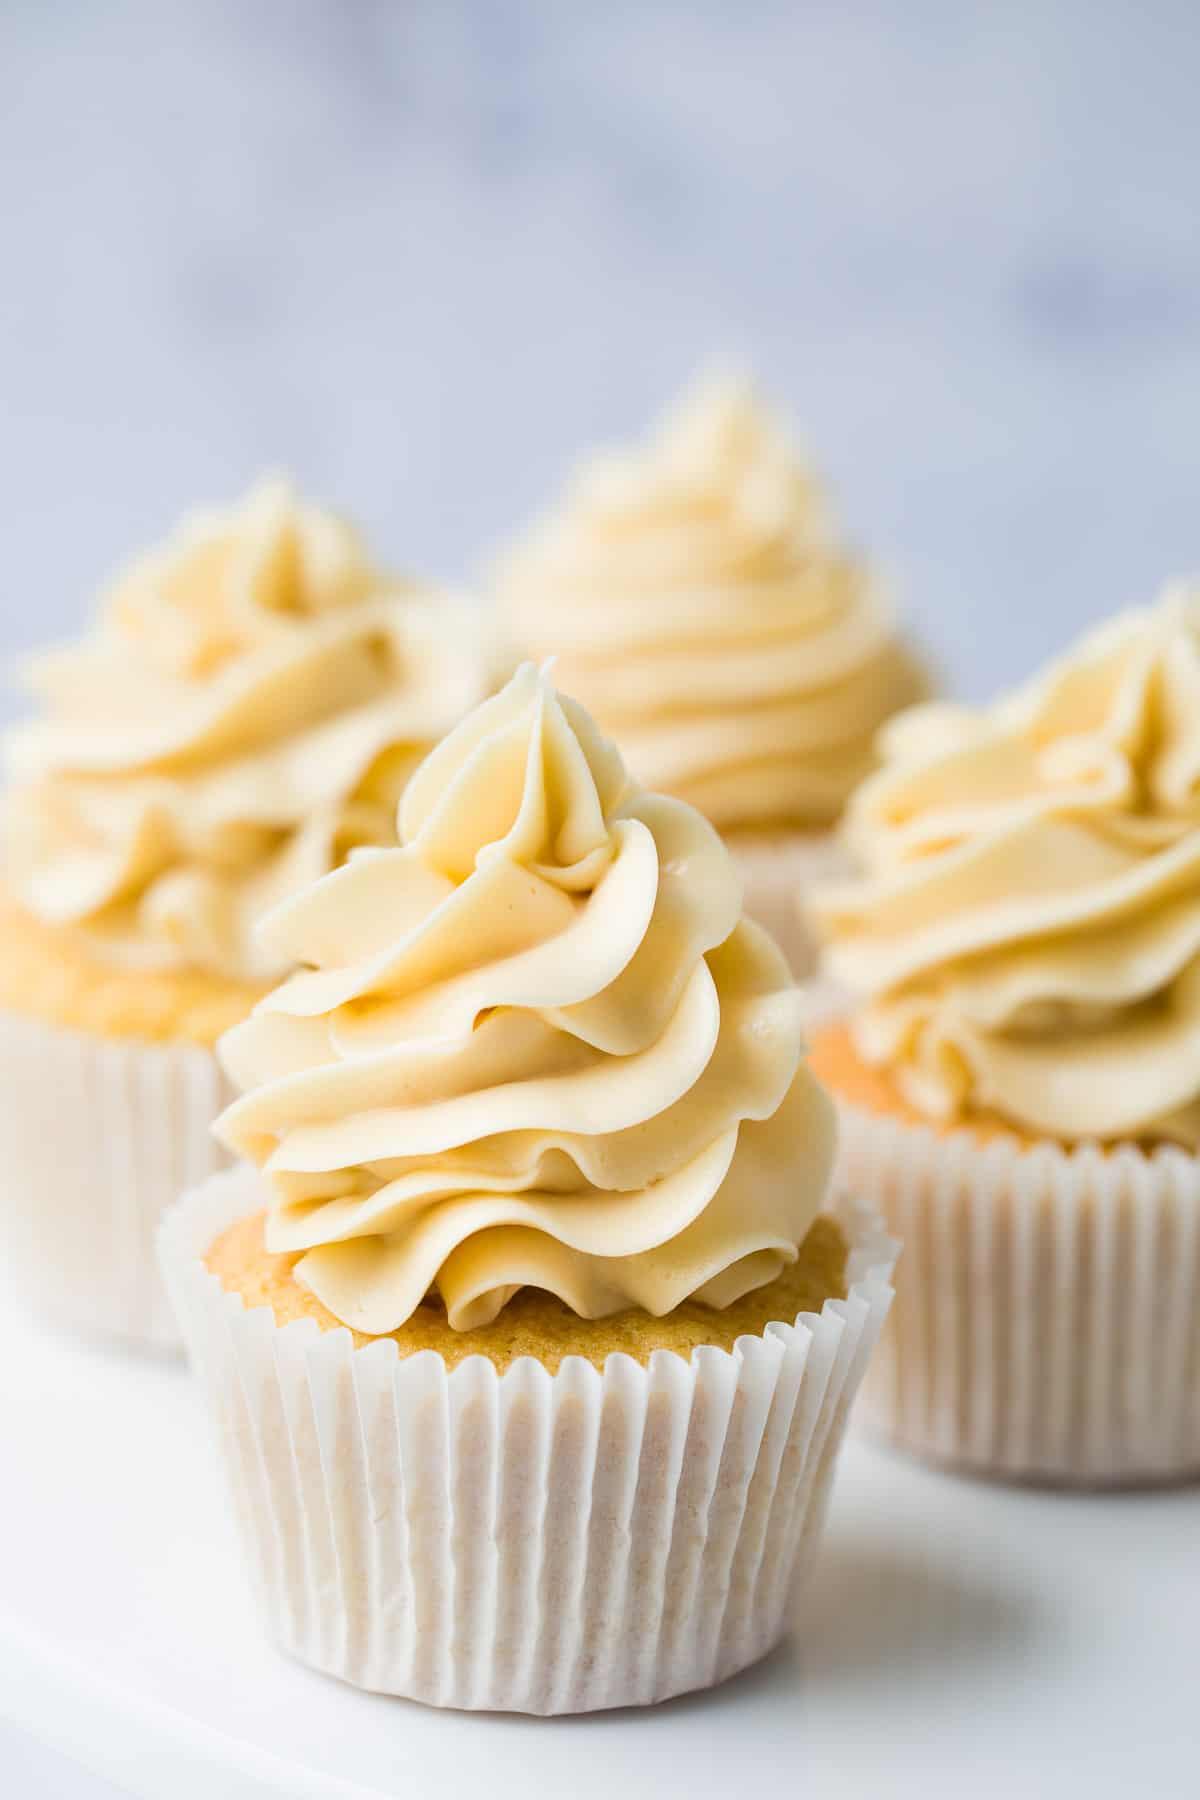 A moist vanilla cupcake with vanilla flavoured buttercream icing.